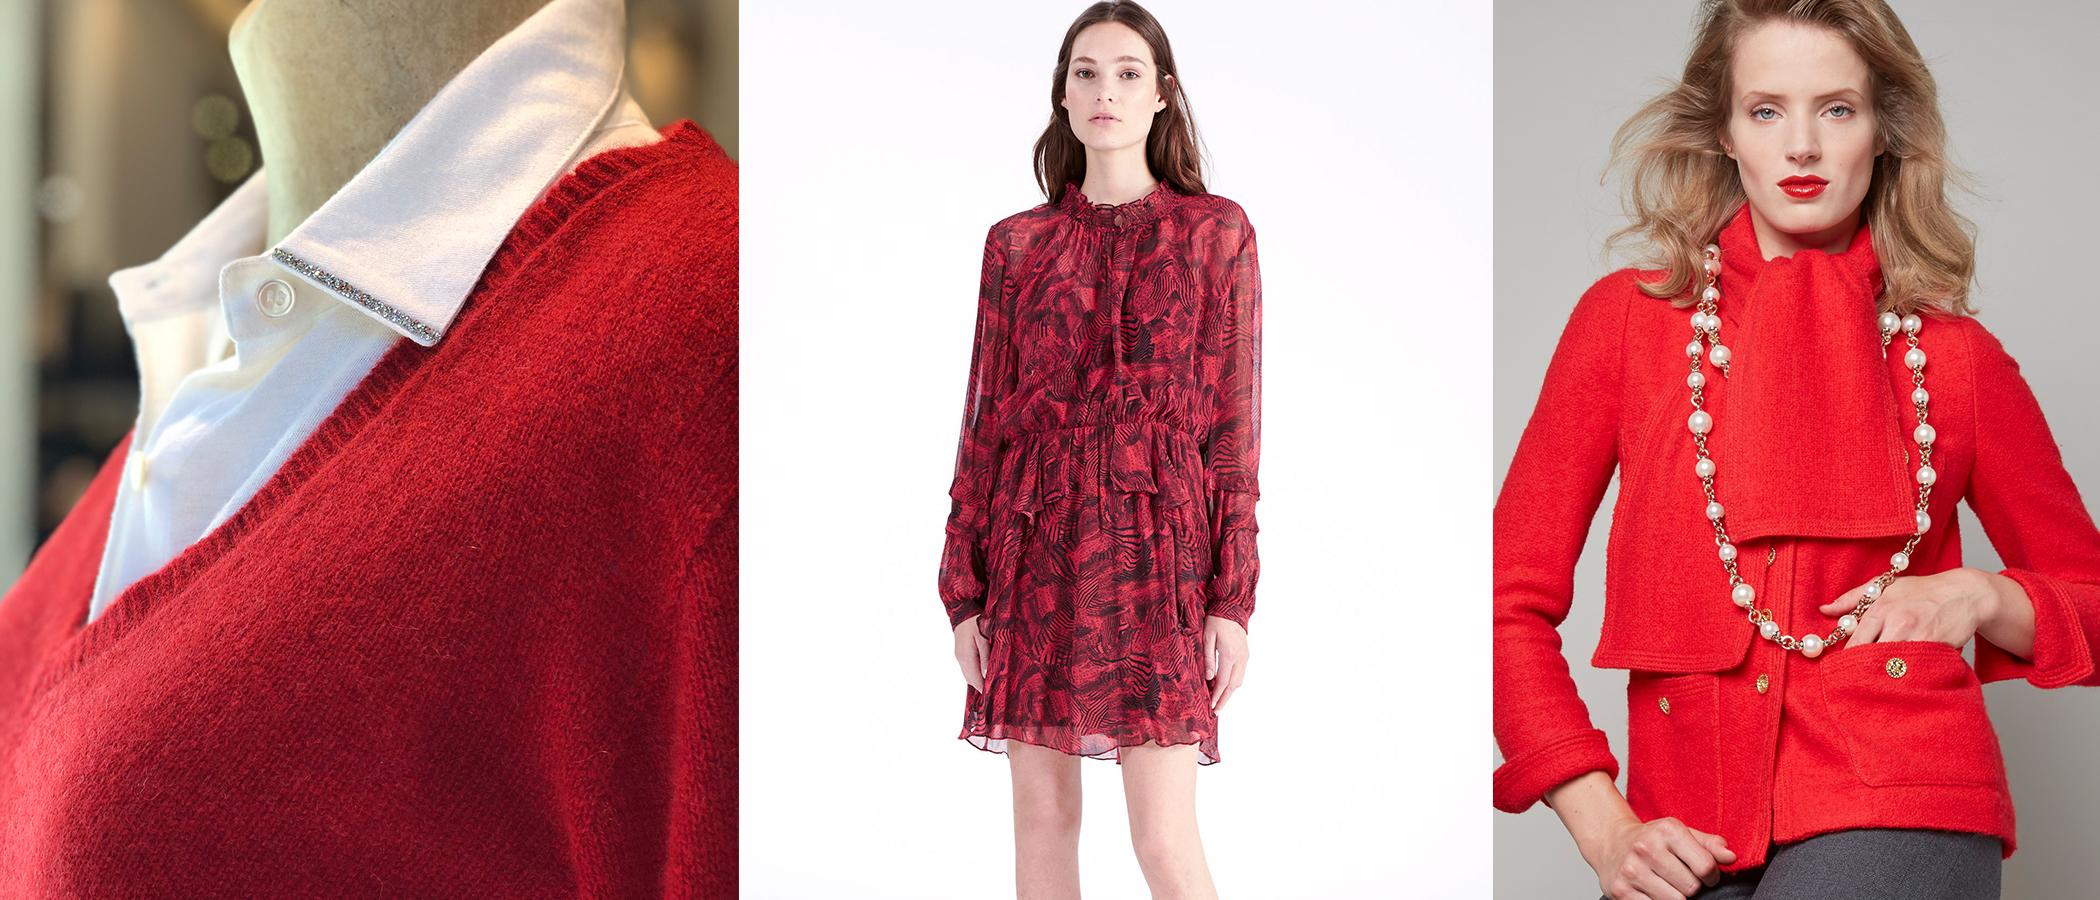 (L to R: Majestic Cashmere V-Neck Sweater, IRO Dress, Edward Achour Paris Crew Jacket)